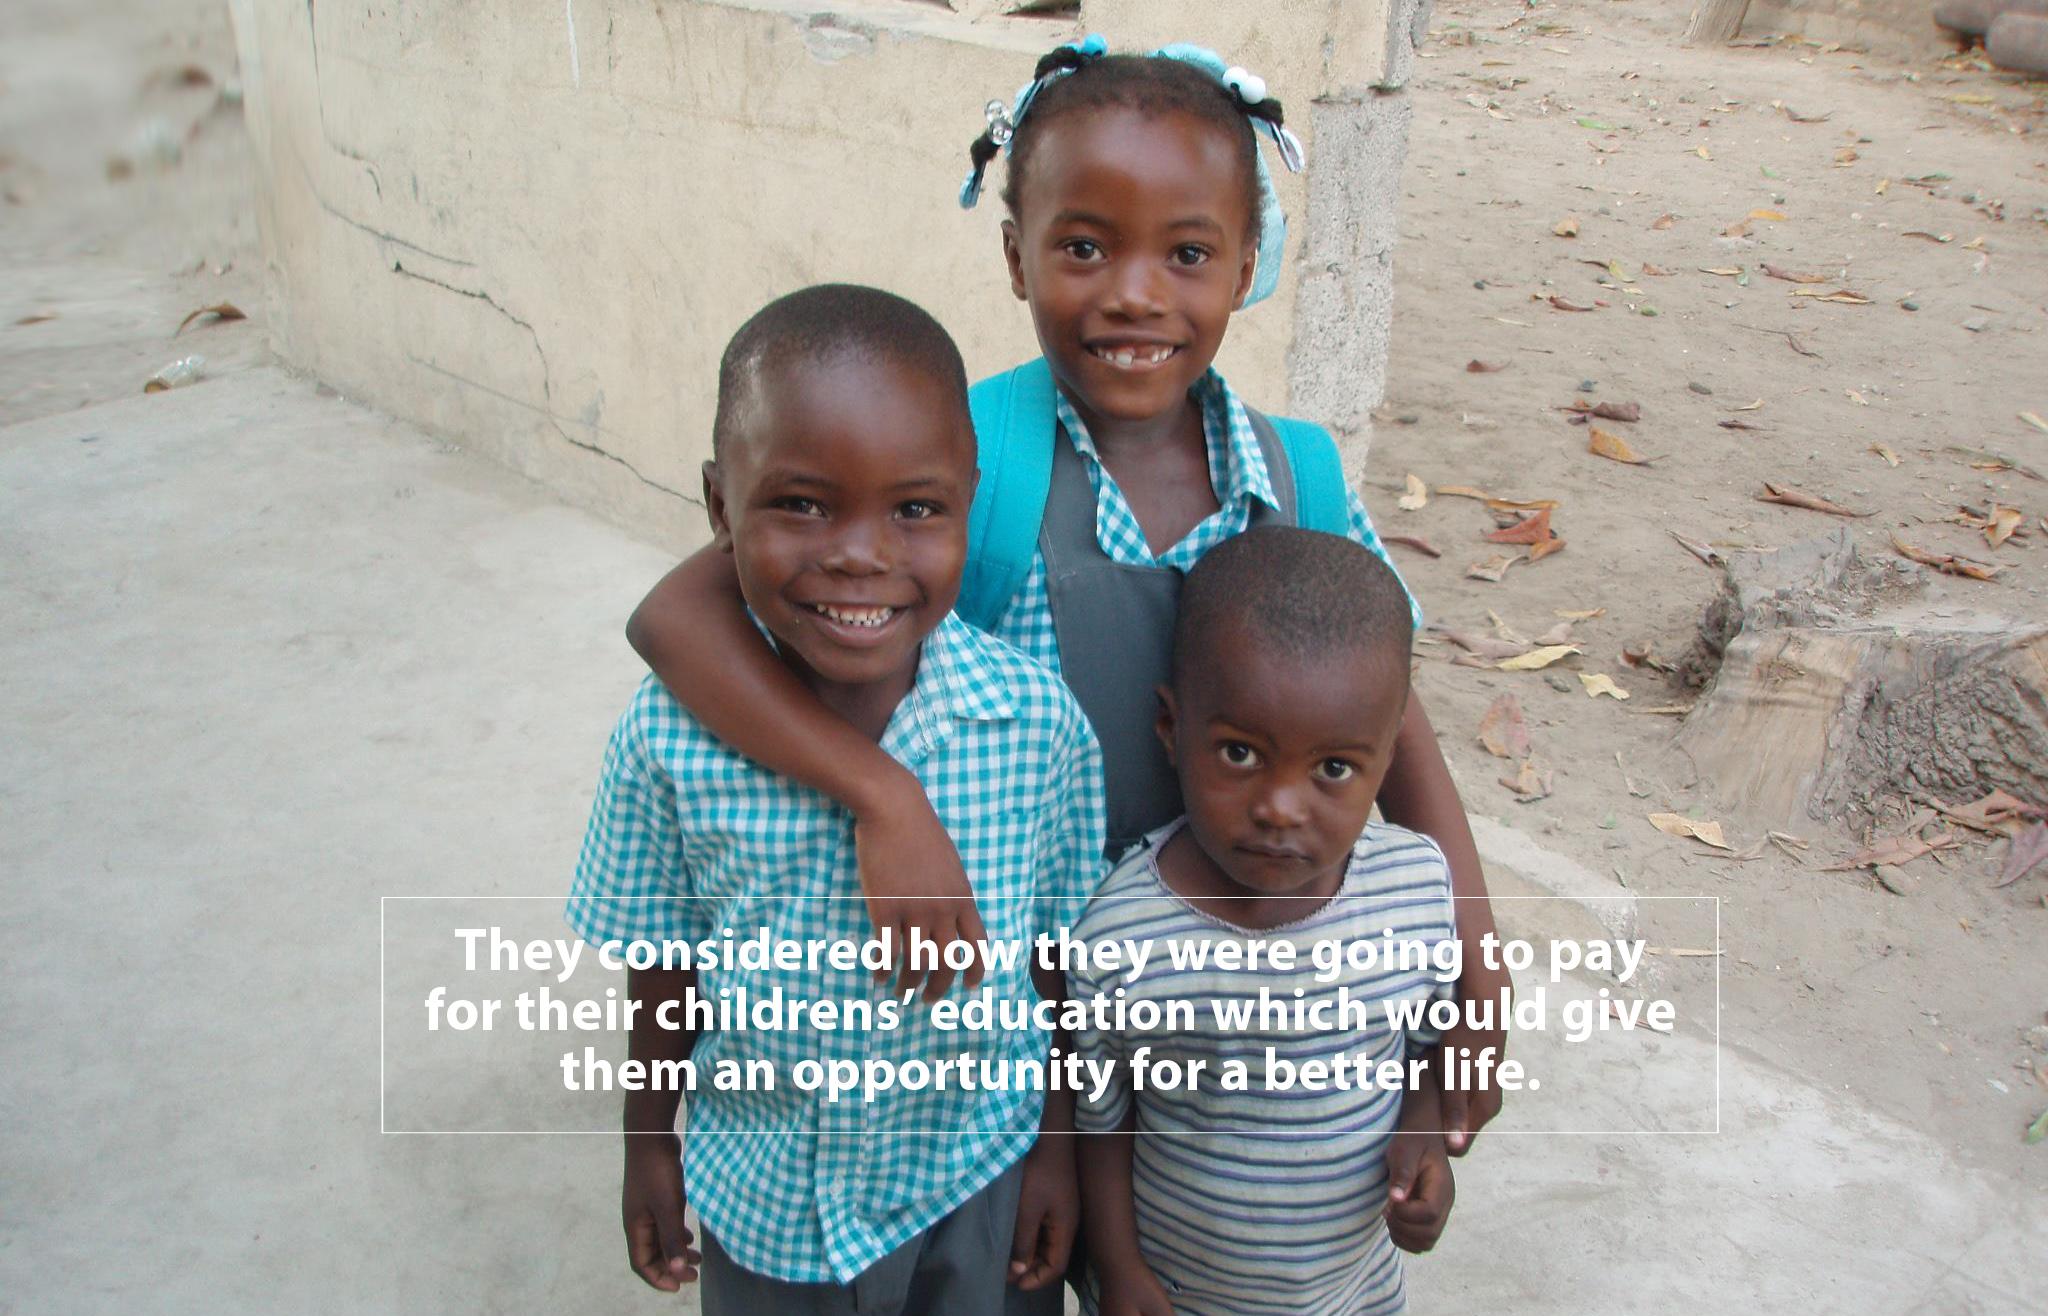 friends of haiti organization